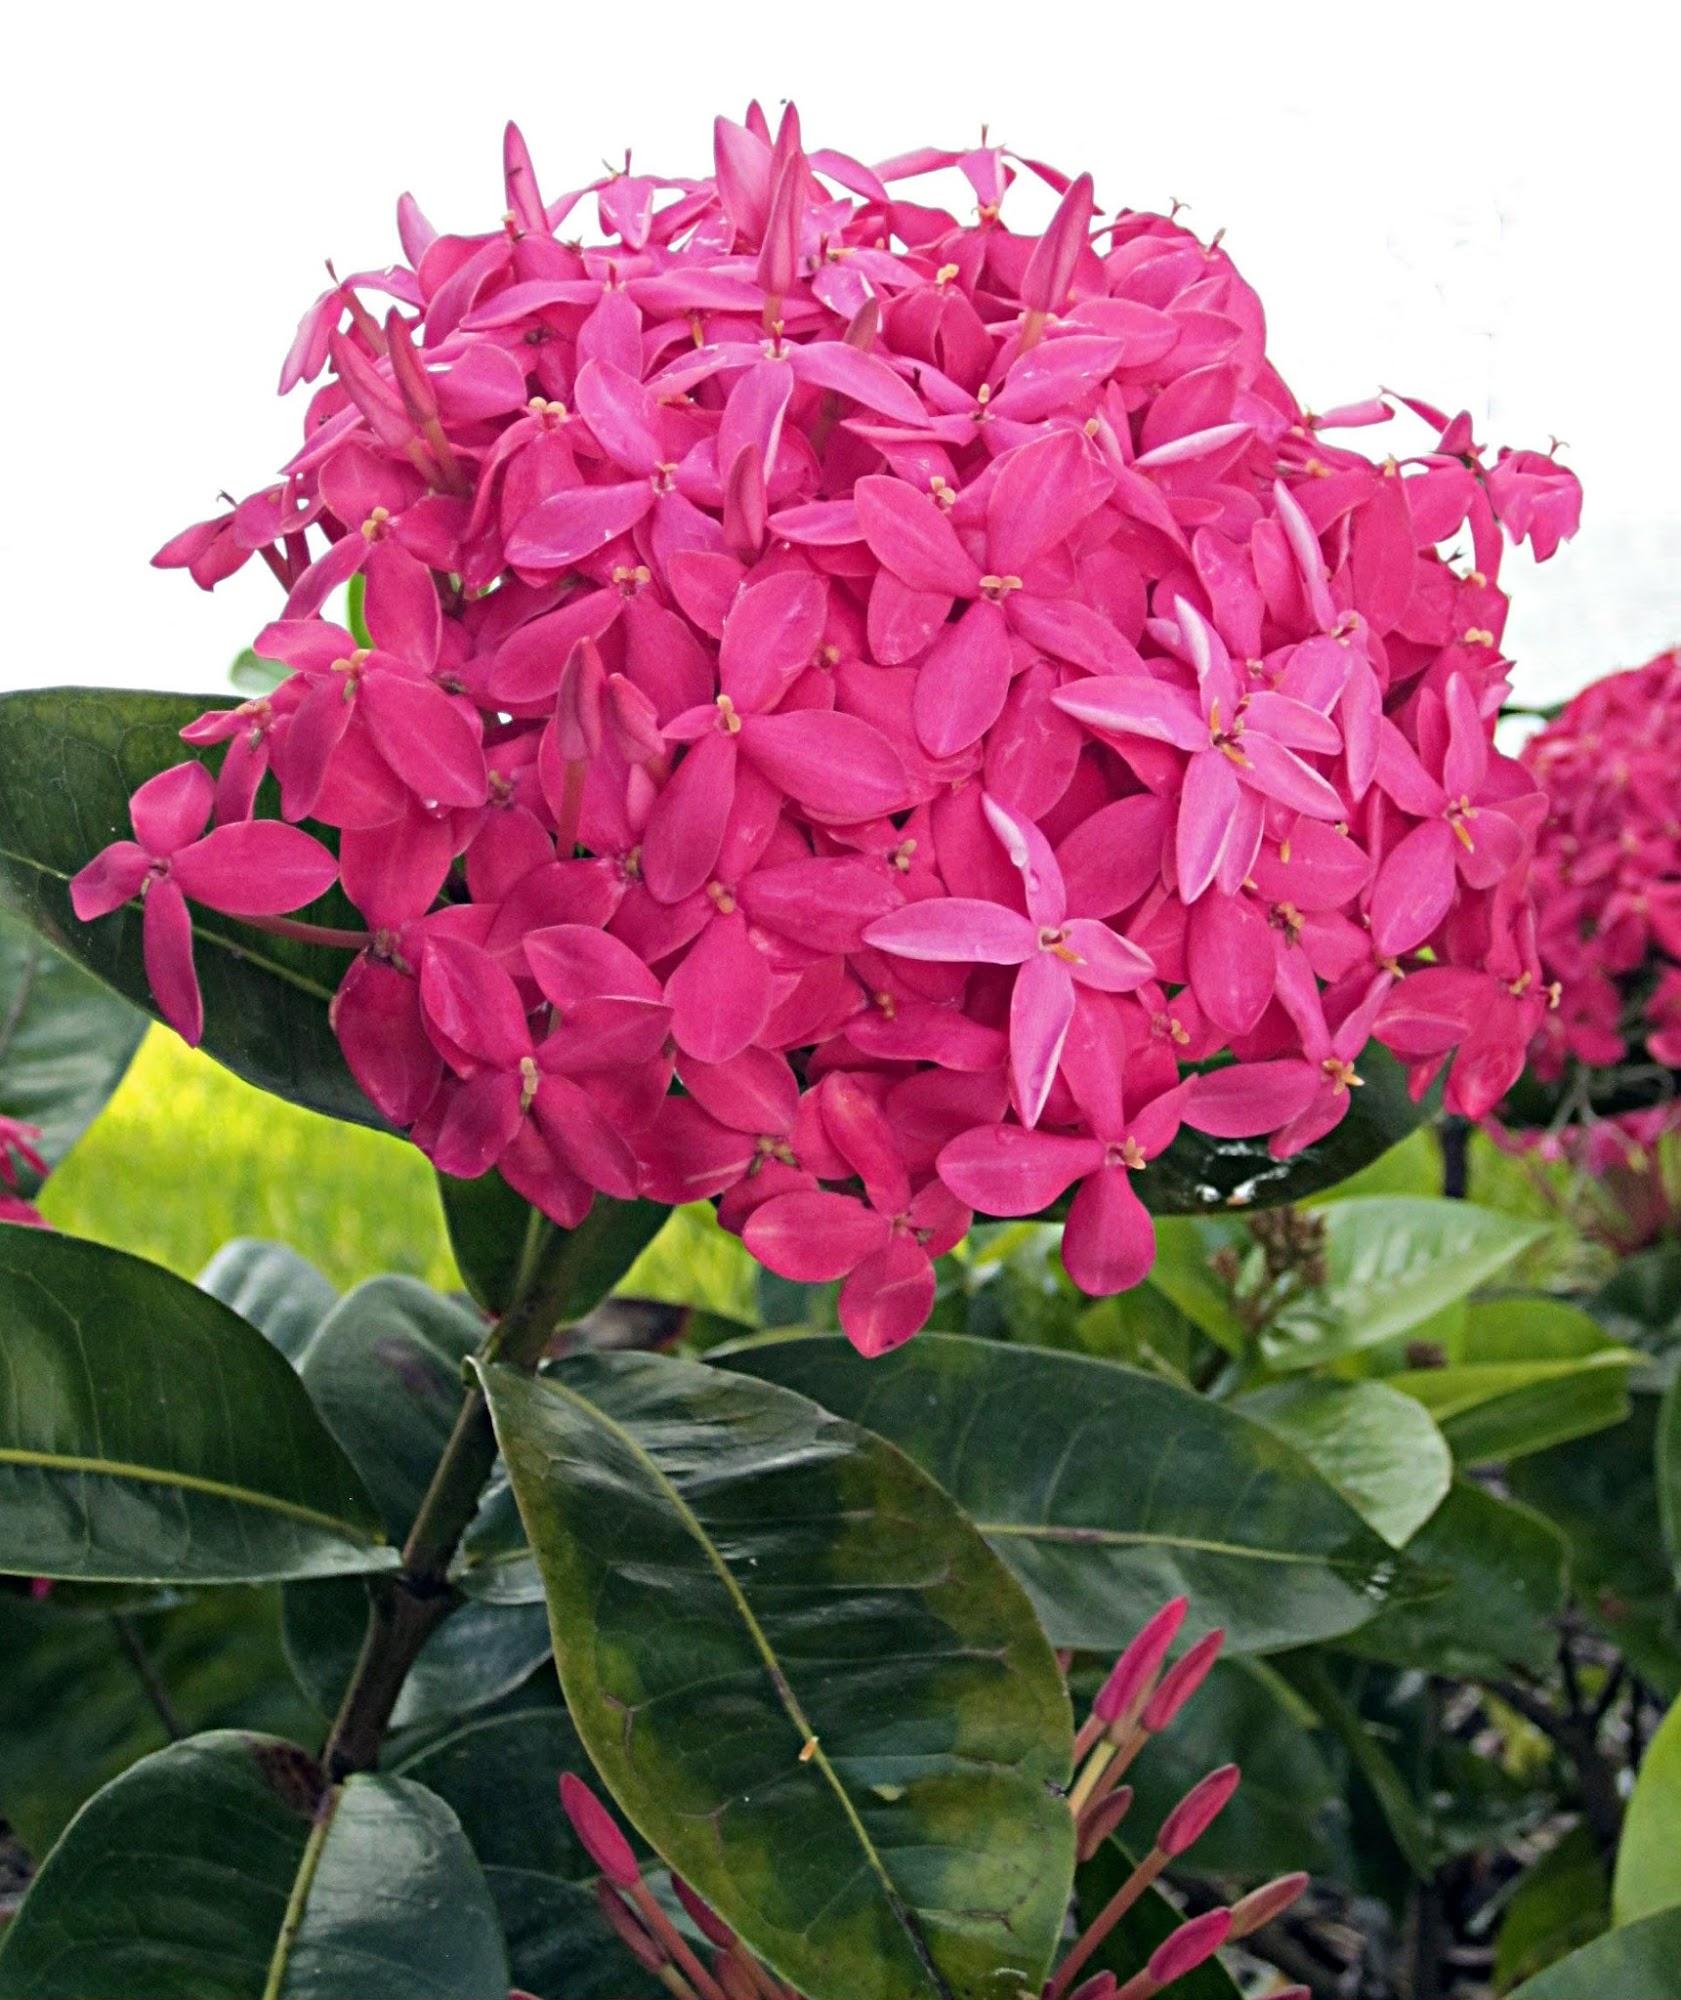 Ixora plant, flower